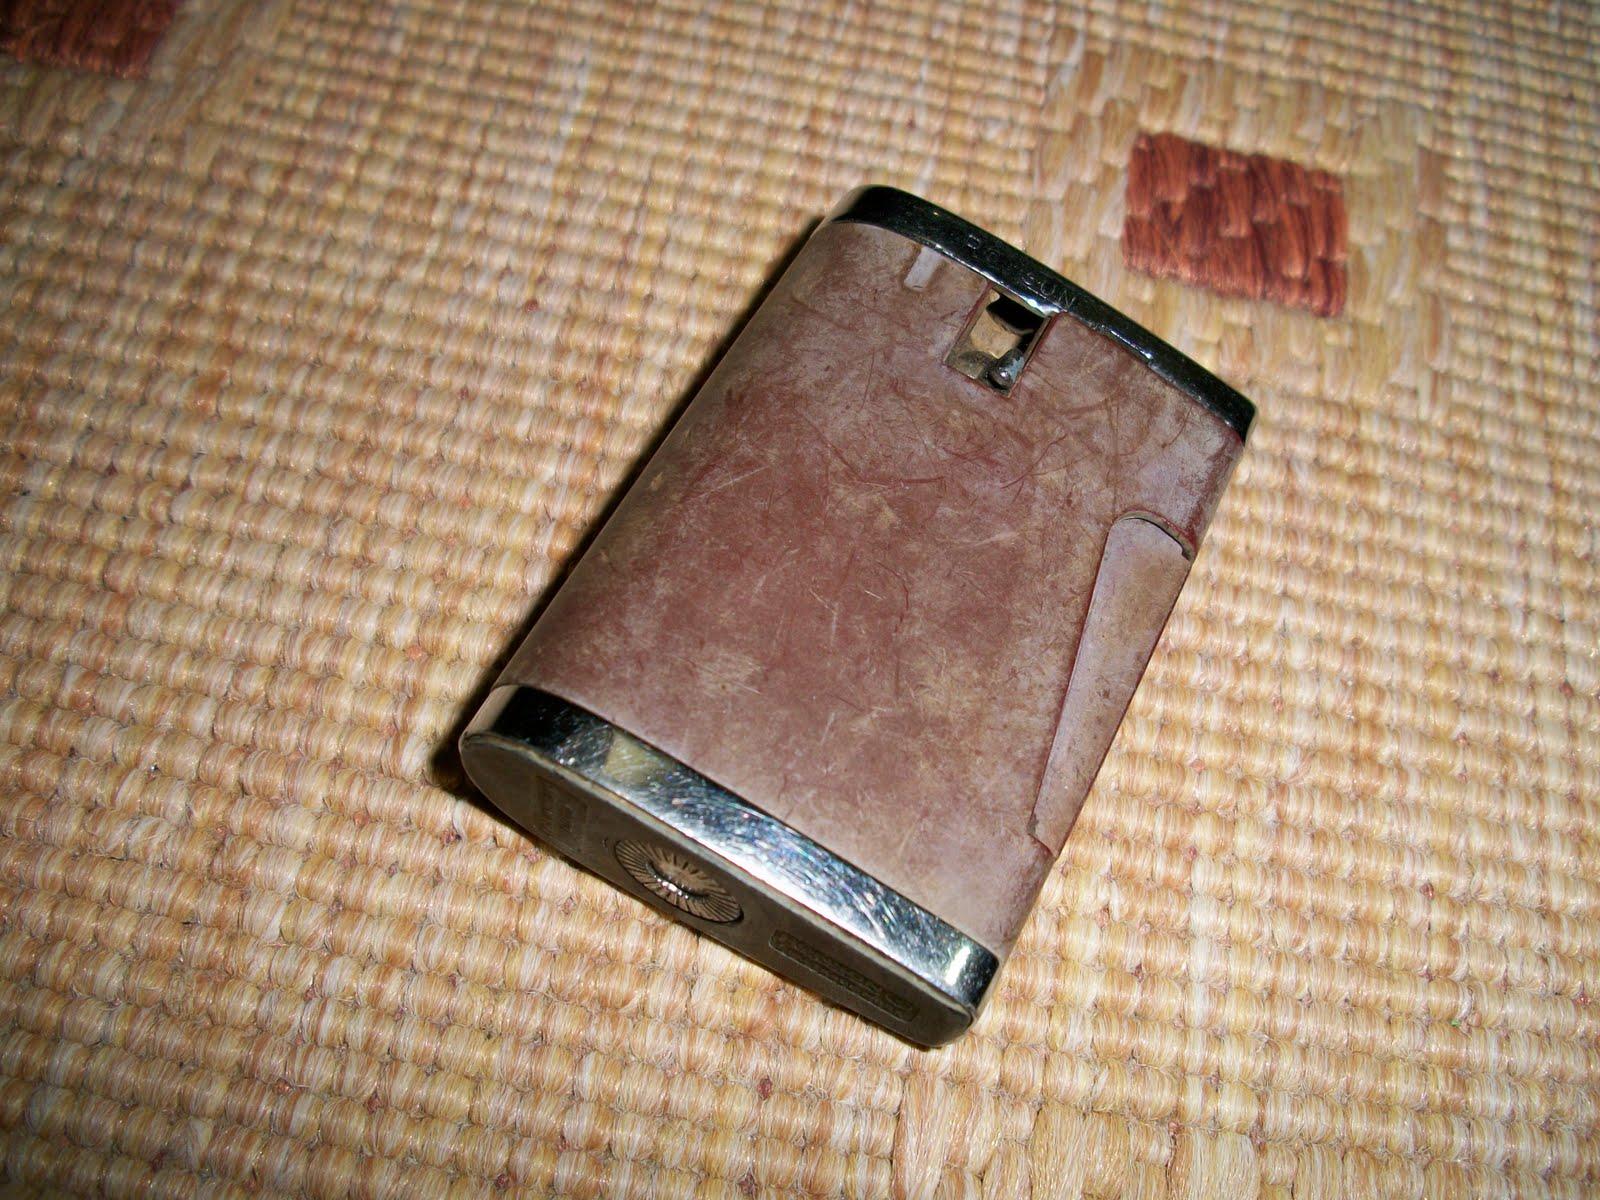 Vintage Ronson Lighter 2 - Made in England